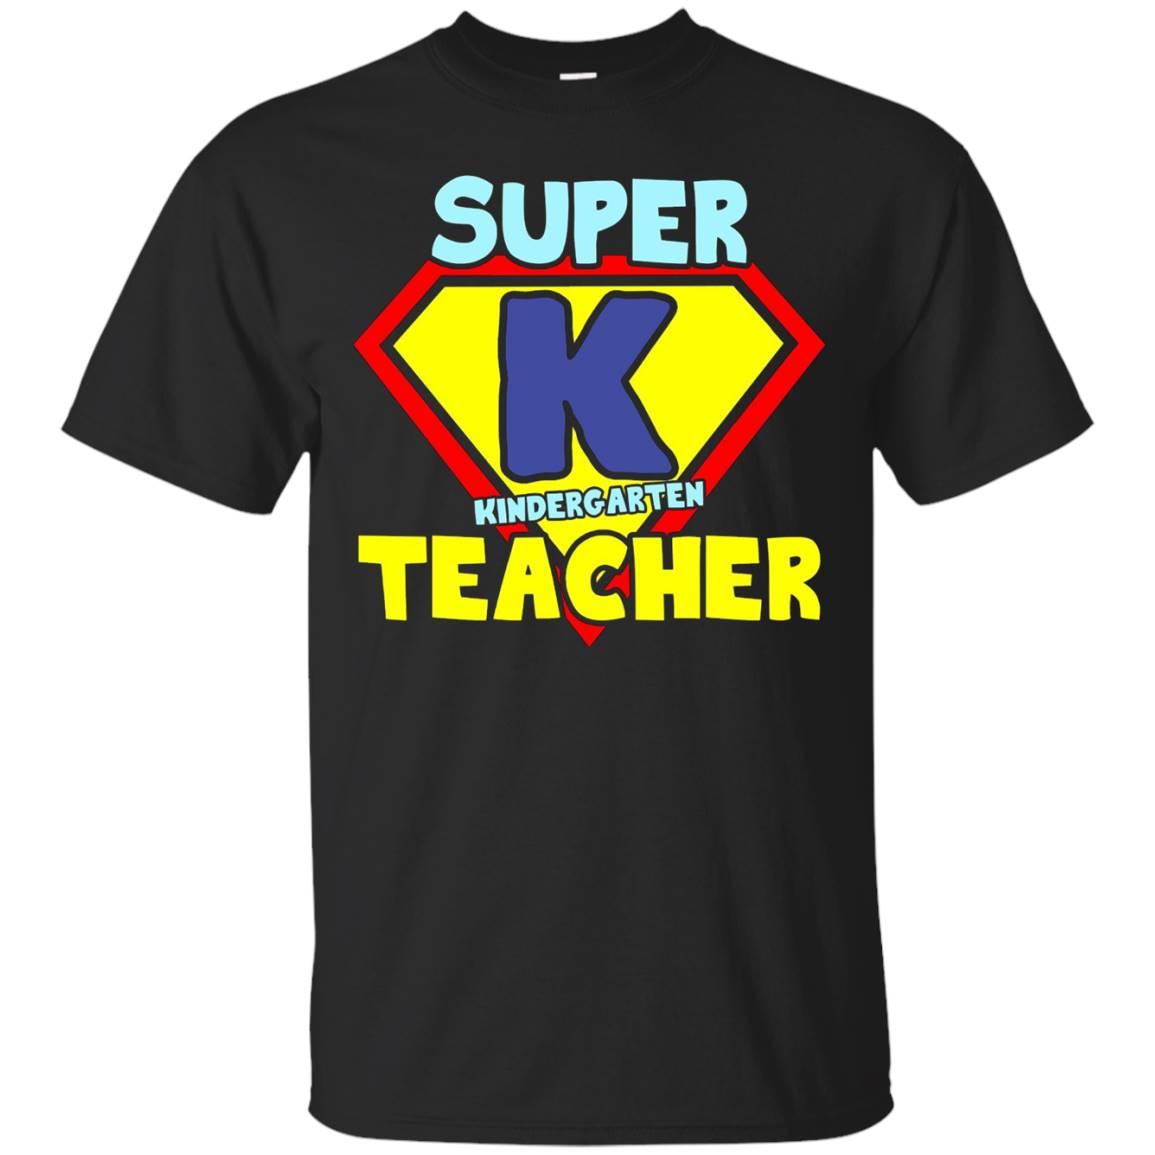 Funny Kindergarten Teachers Quotes, Super K Teacher T-Shirt